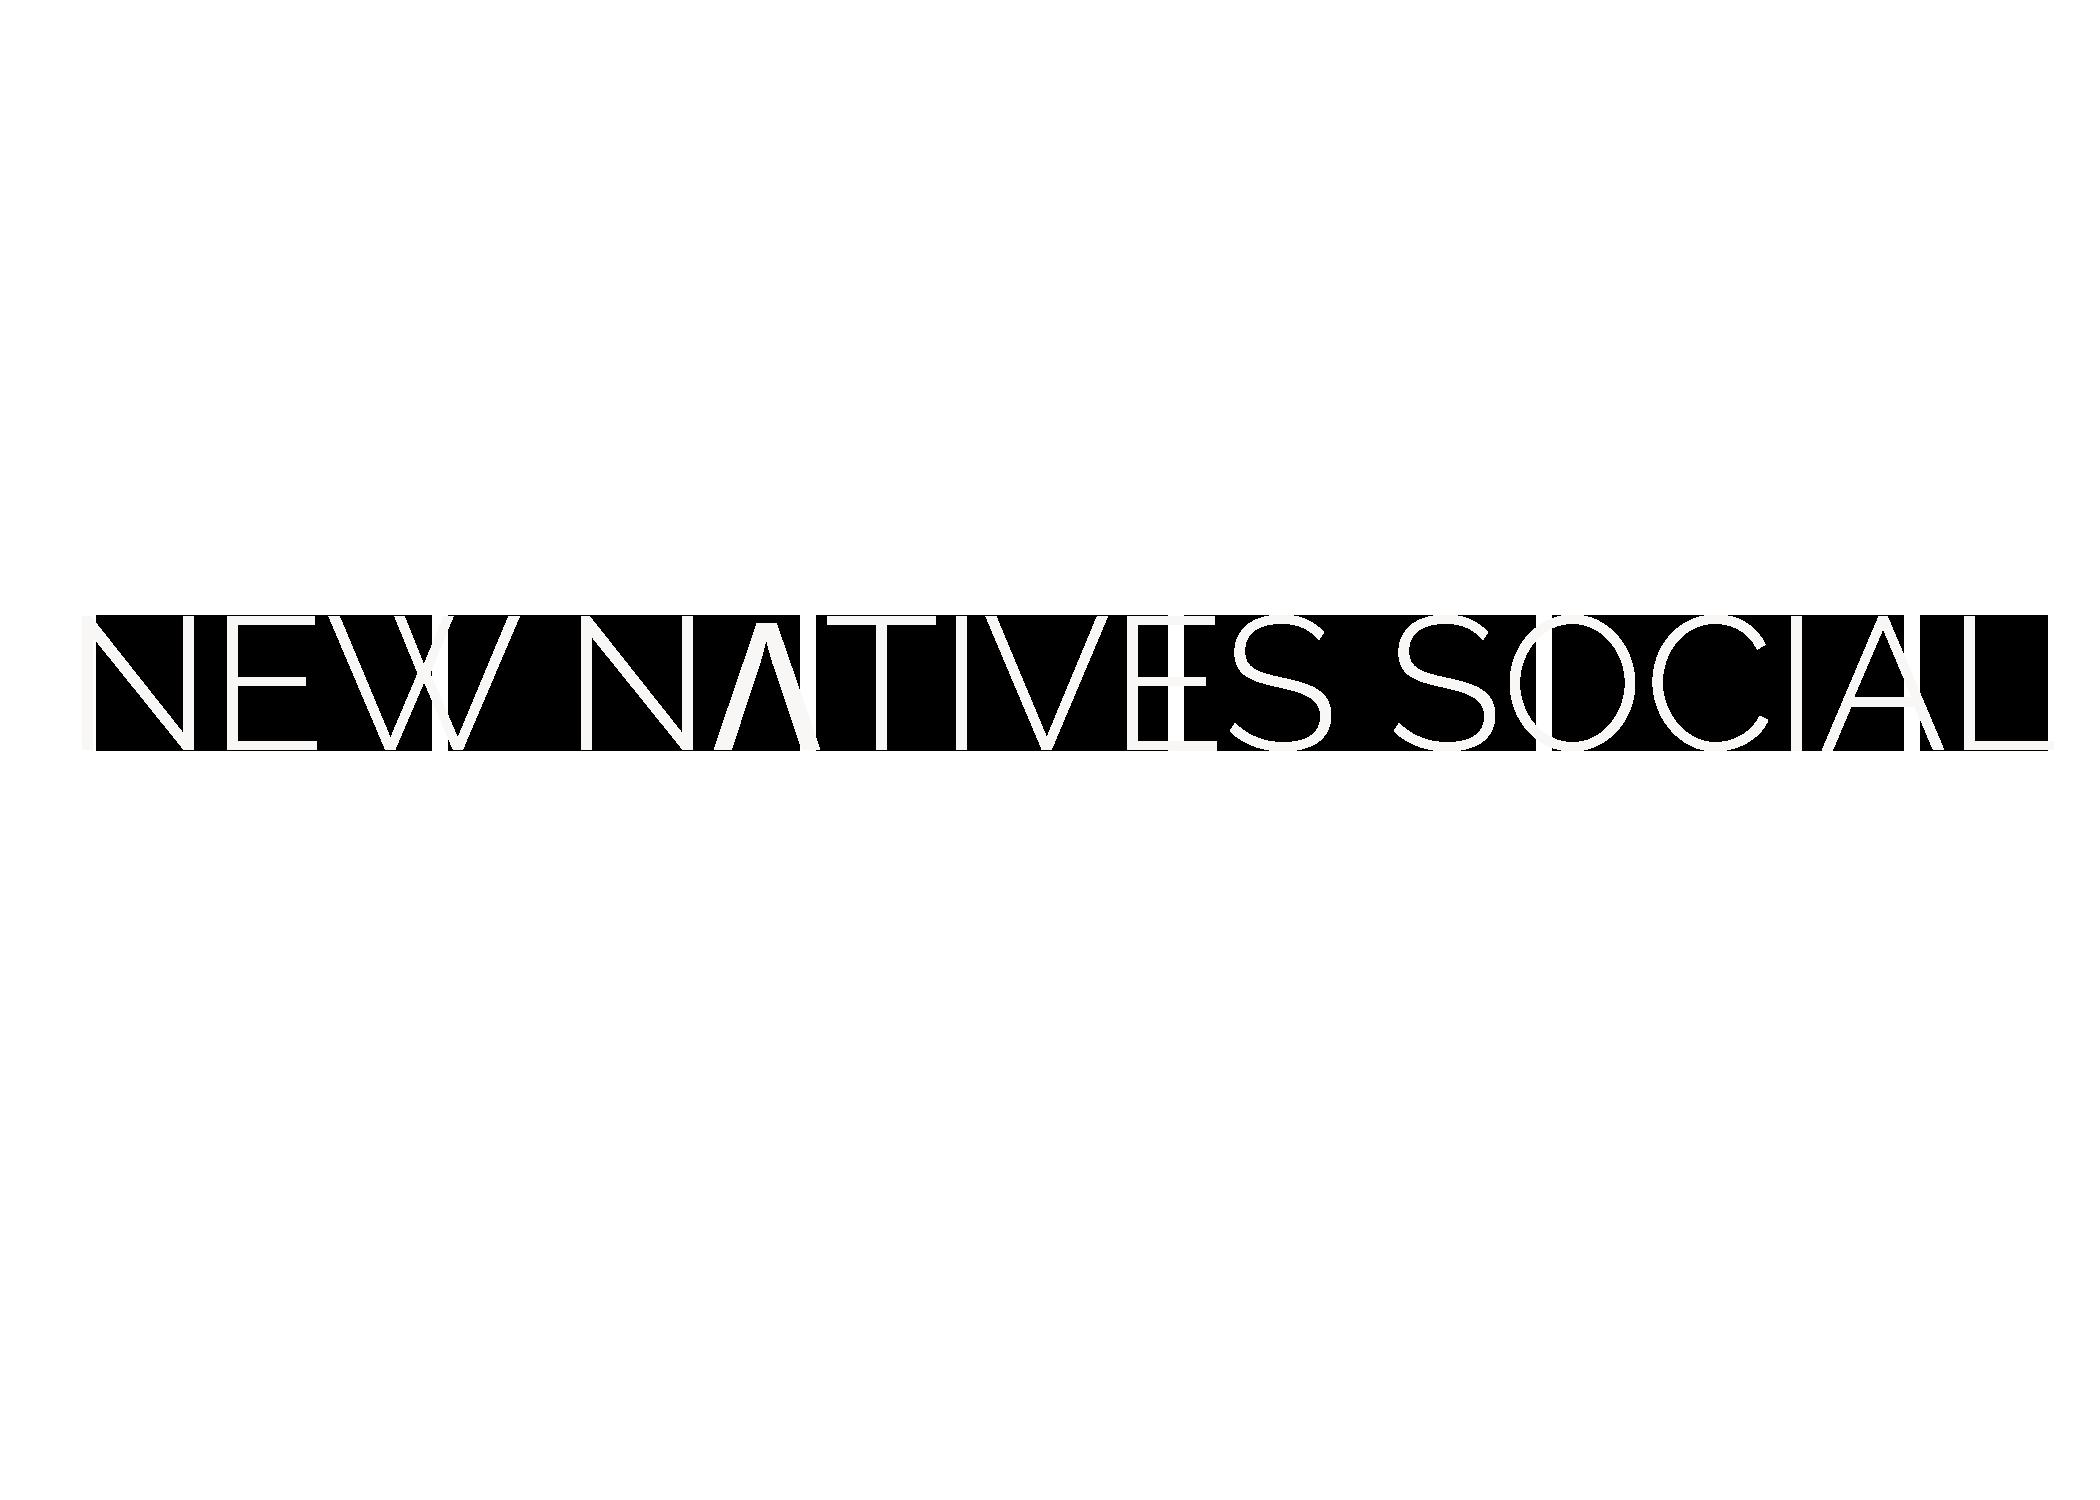 NewNativesSocial_Logo.png